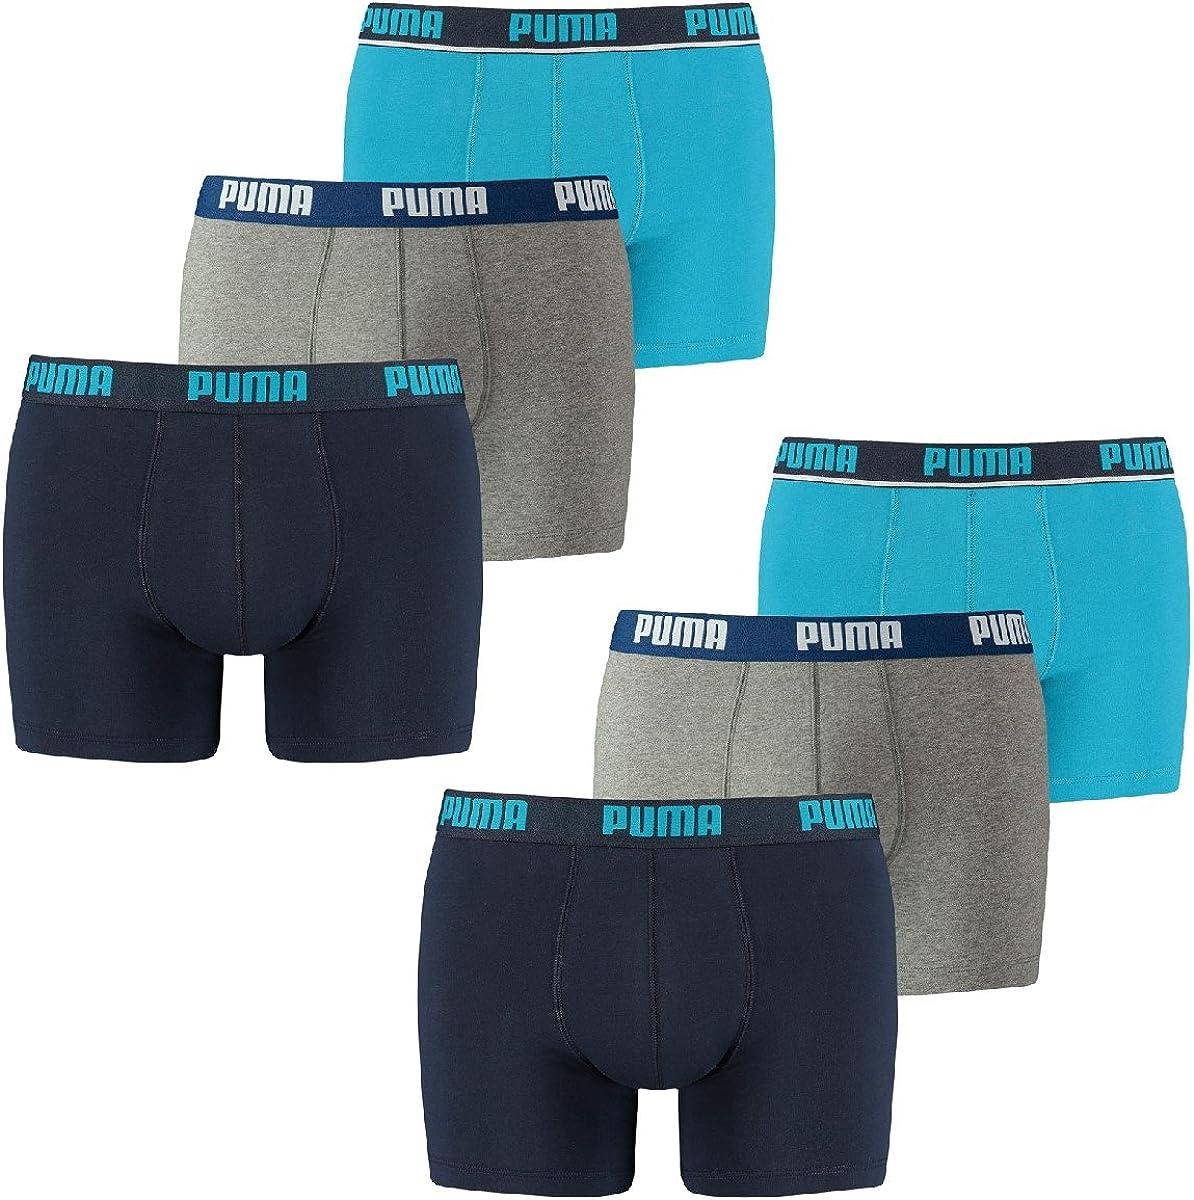 6 er Pack Puma Boxer Boxershorts Men Pant Underwear new, Farben ...